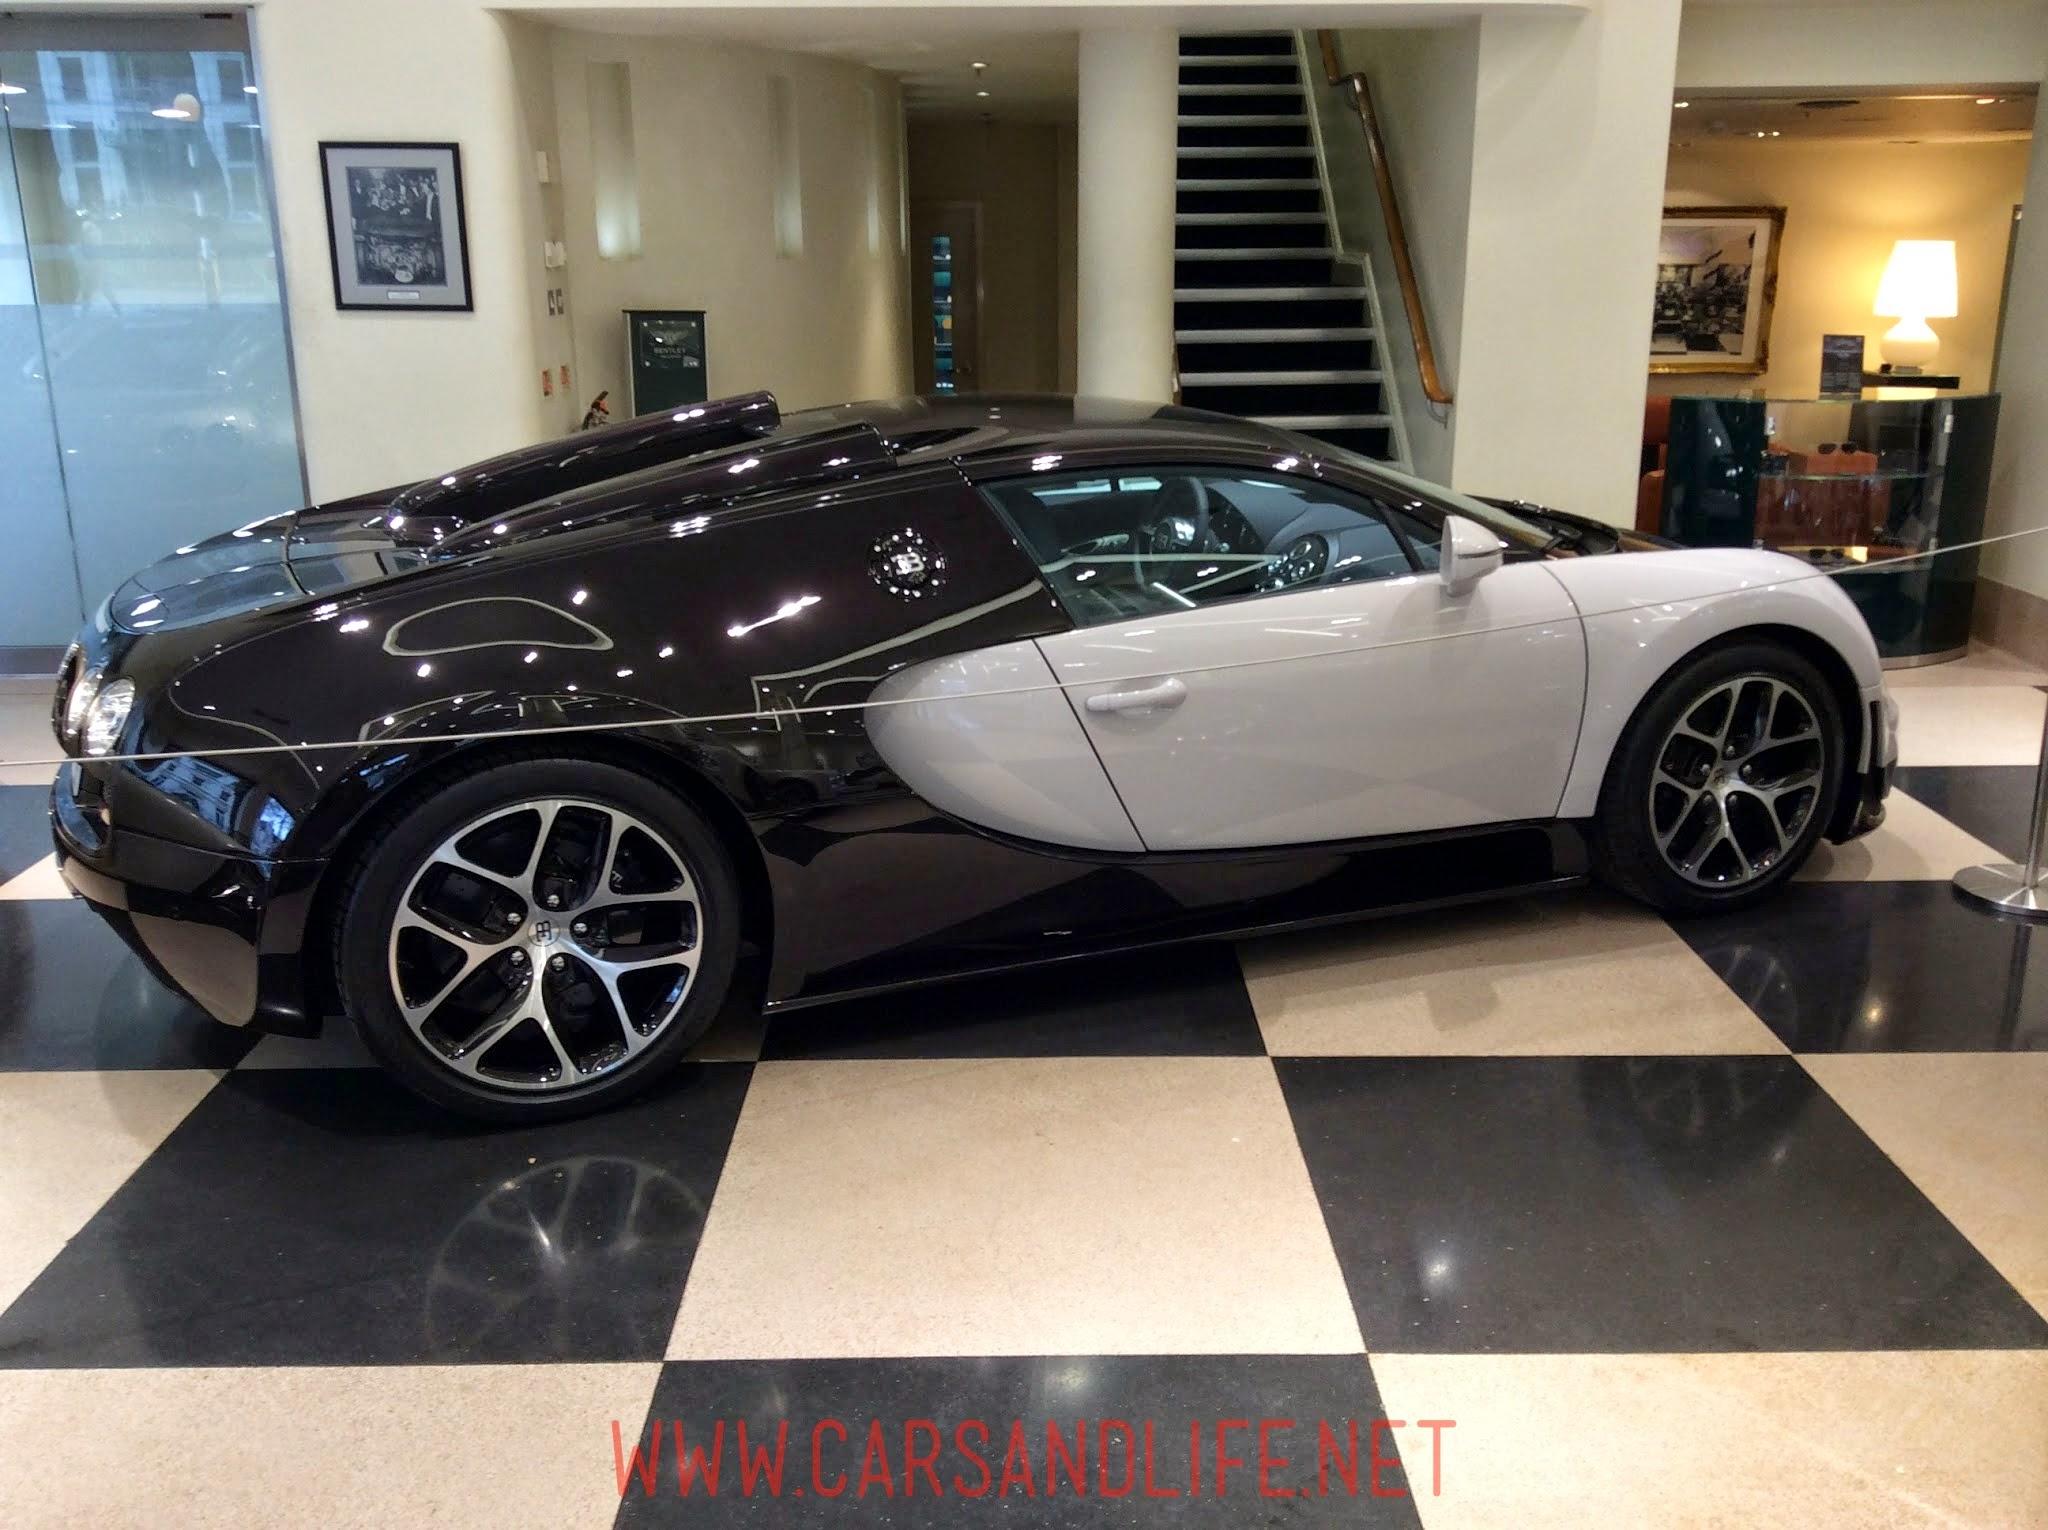 bugatti veyron week at jack barclay hr owen london cars. Black Bedroom Furniture Sets. Home Design Ideas